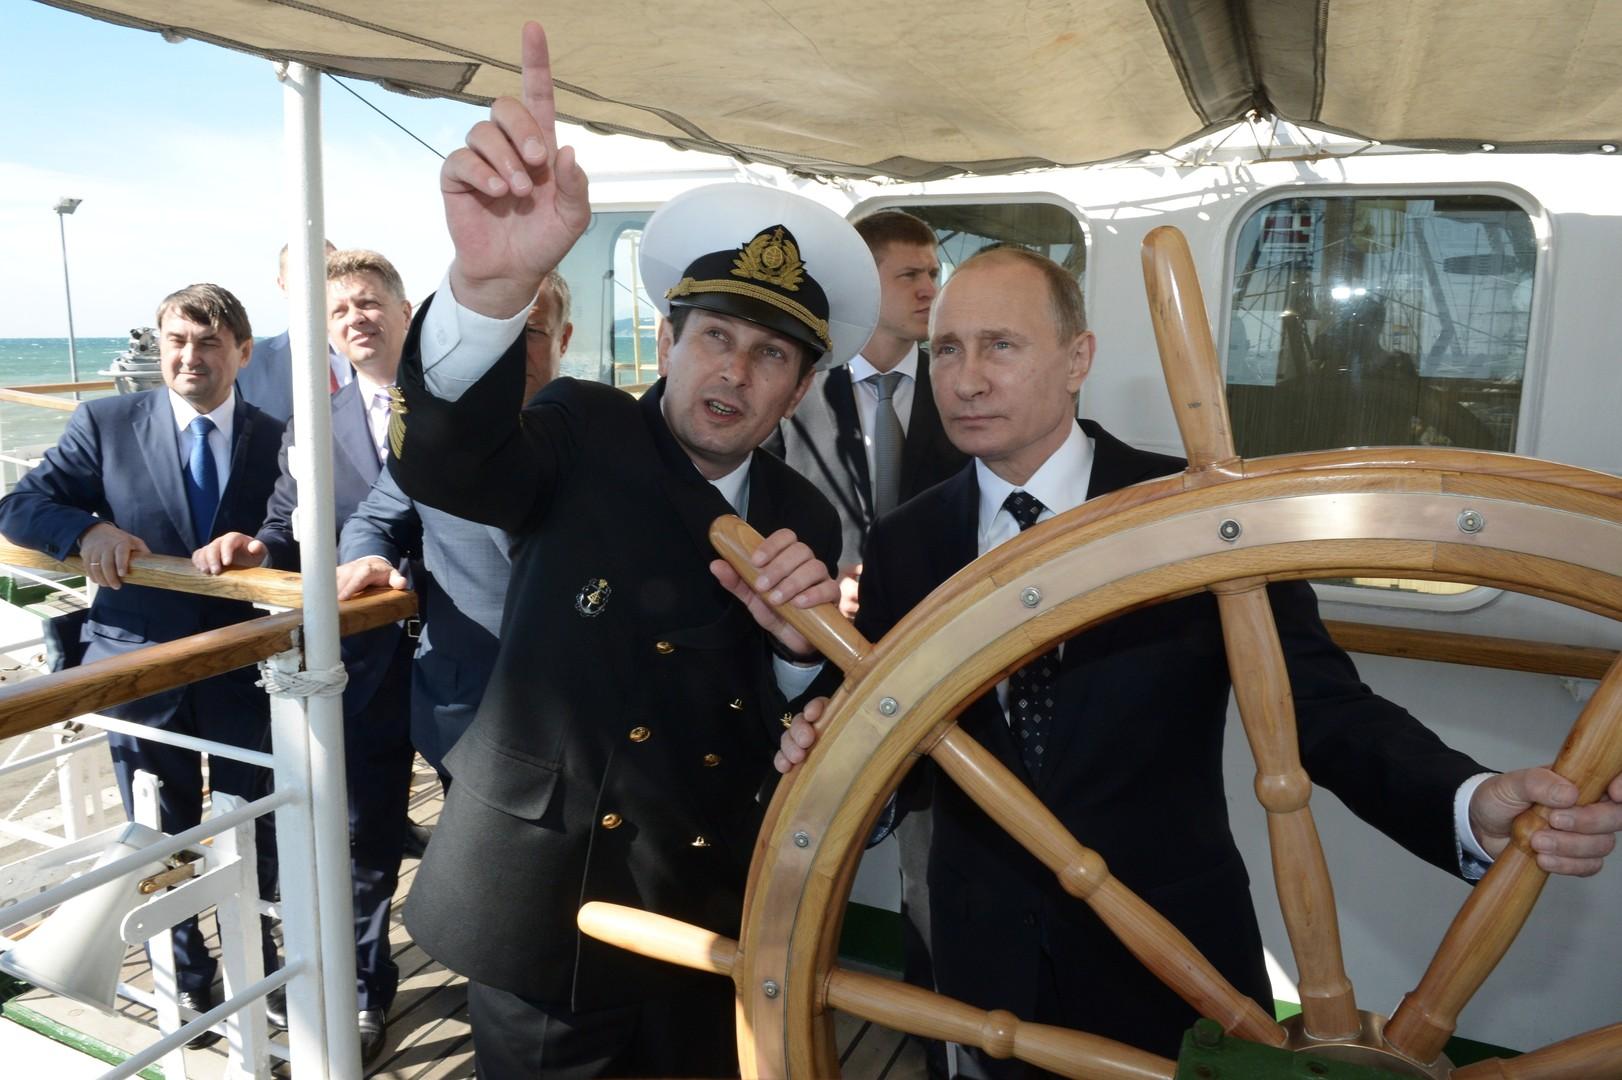 Владимир Путин за штурвалом парусного судна «Надежда» в Сочи.